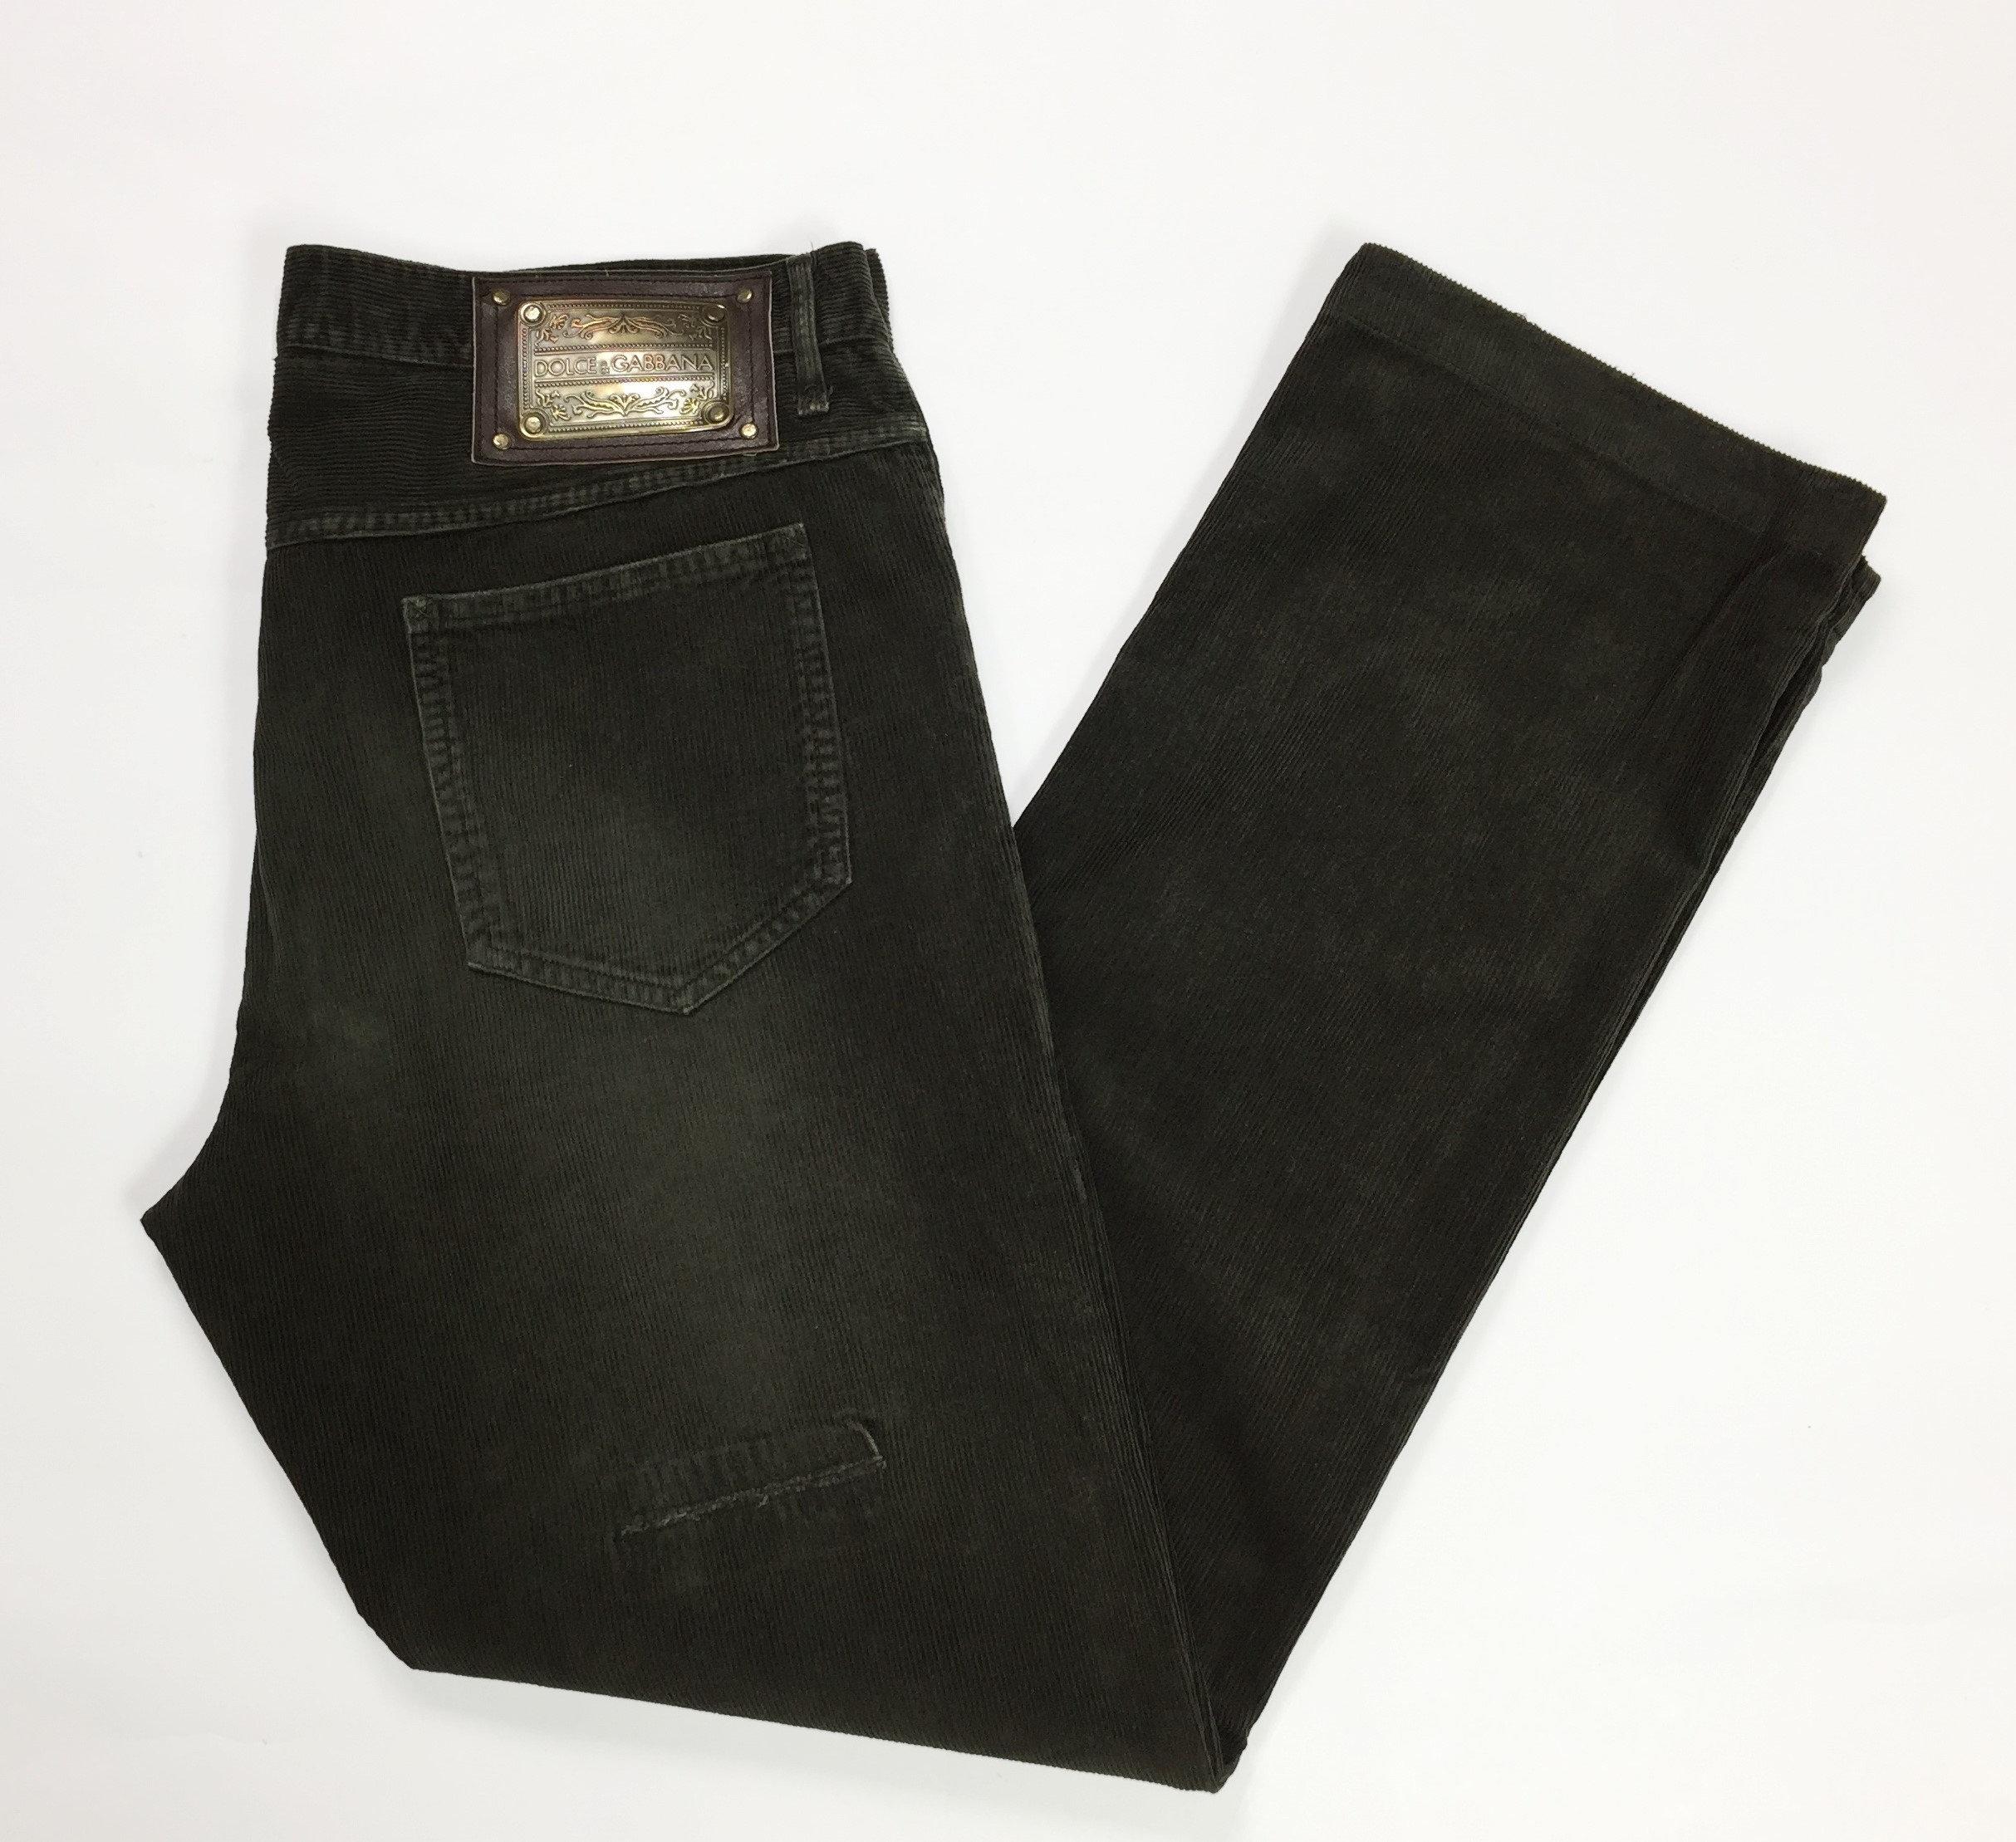 Dolce Gabbana d g w38 tg 52 pantalone velluto strappi marrone  3c5abcd43e5